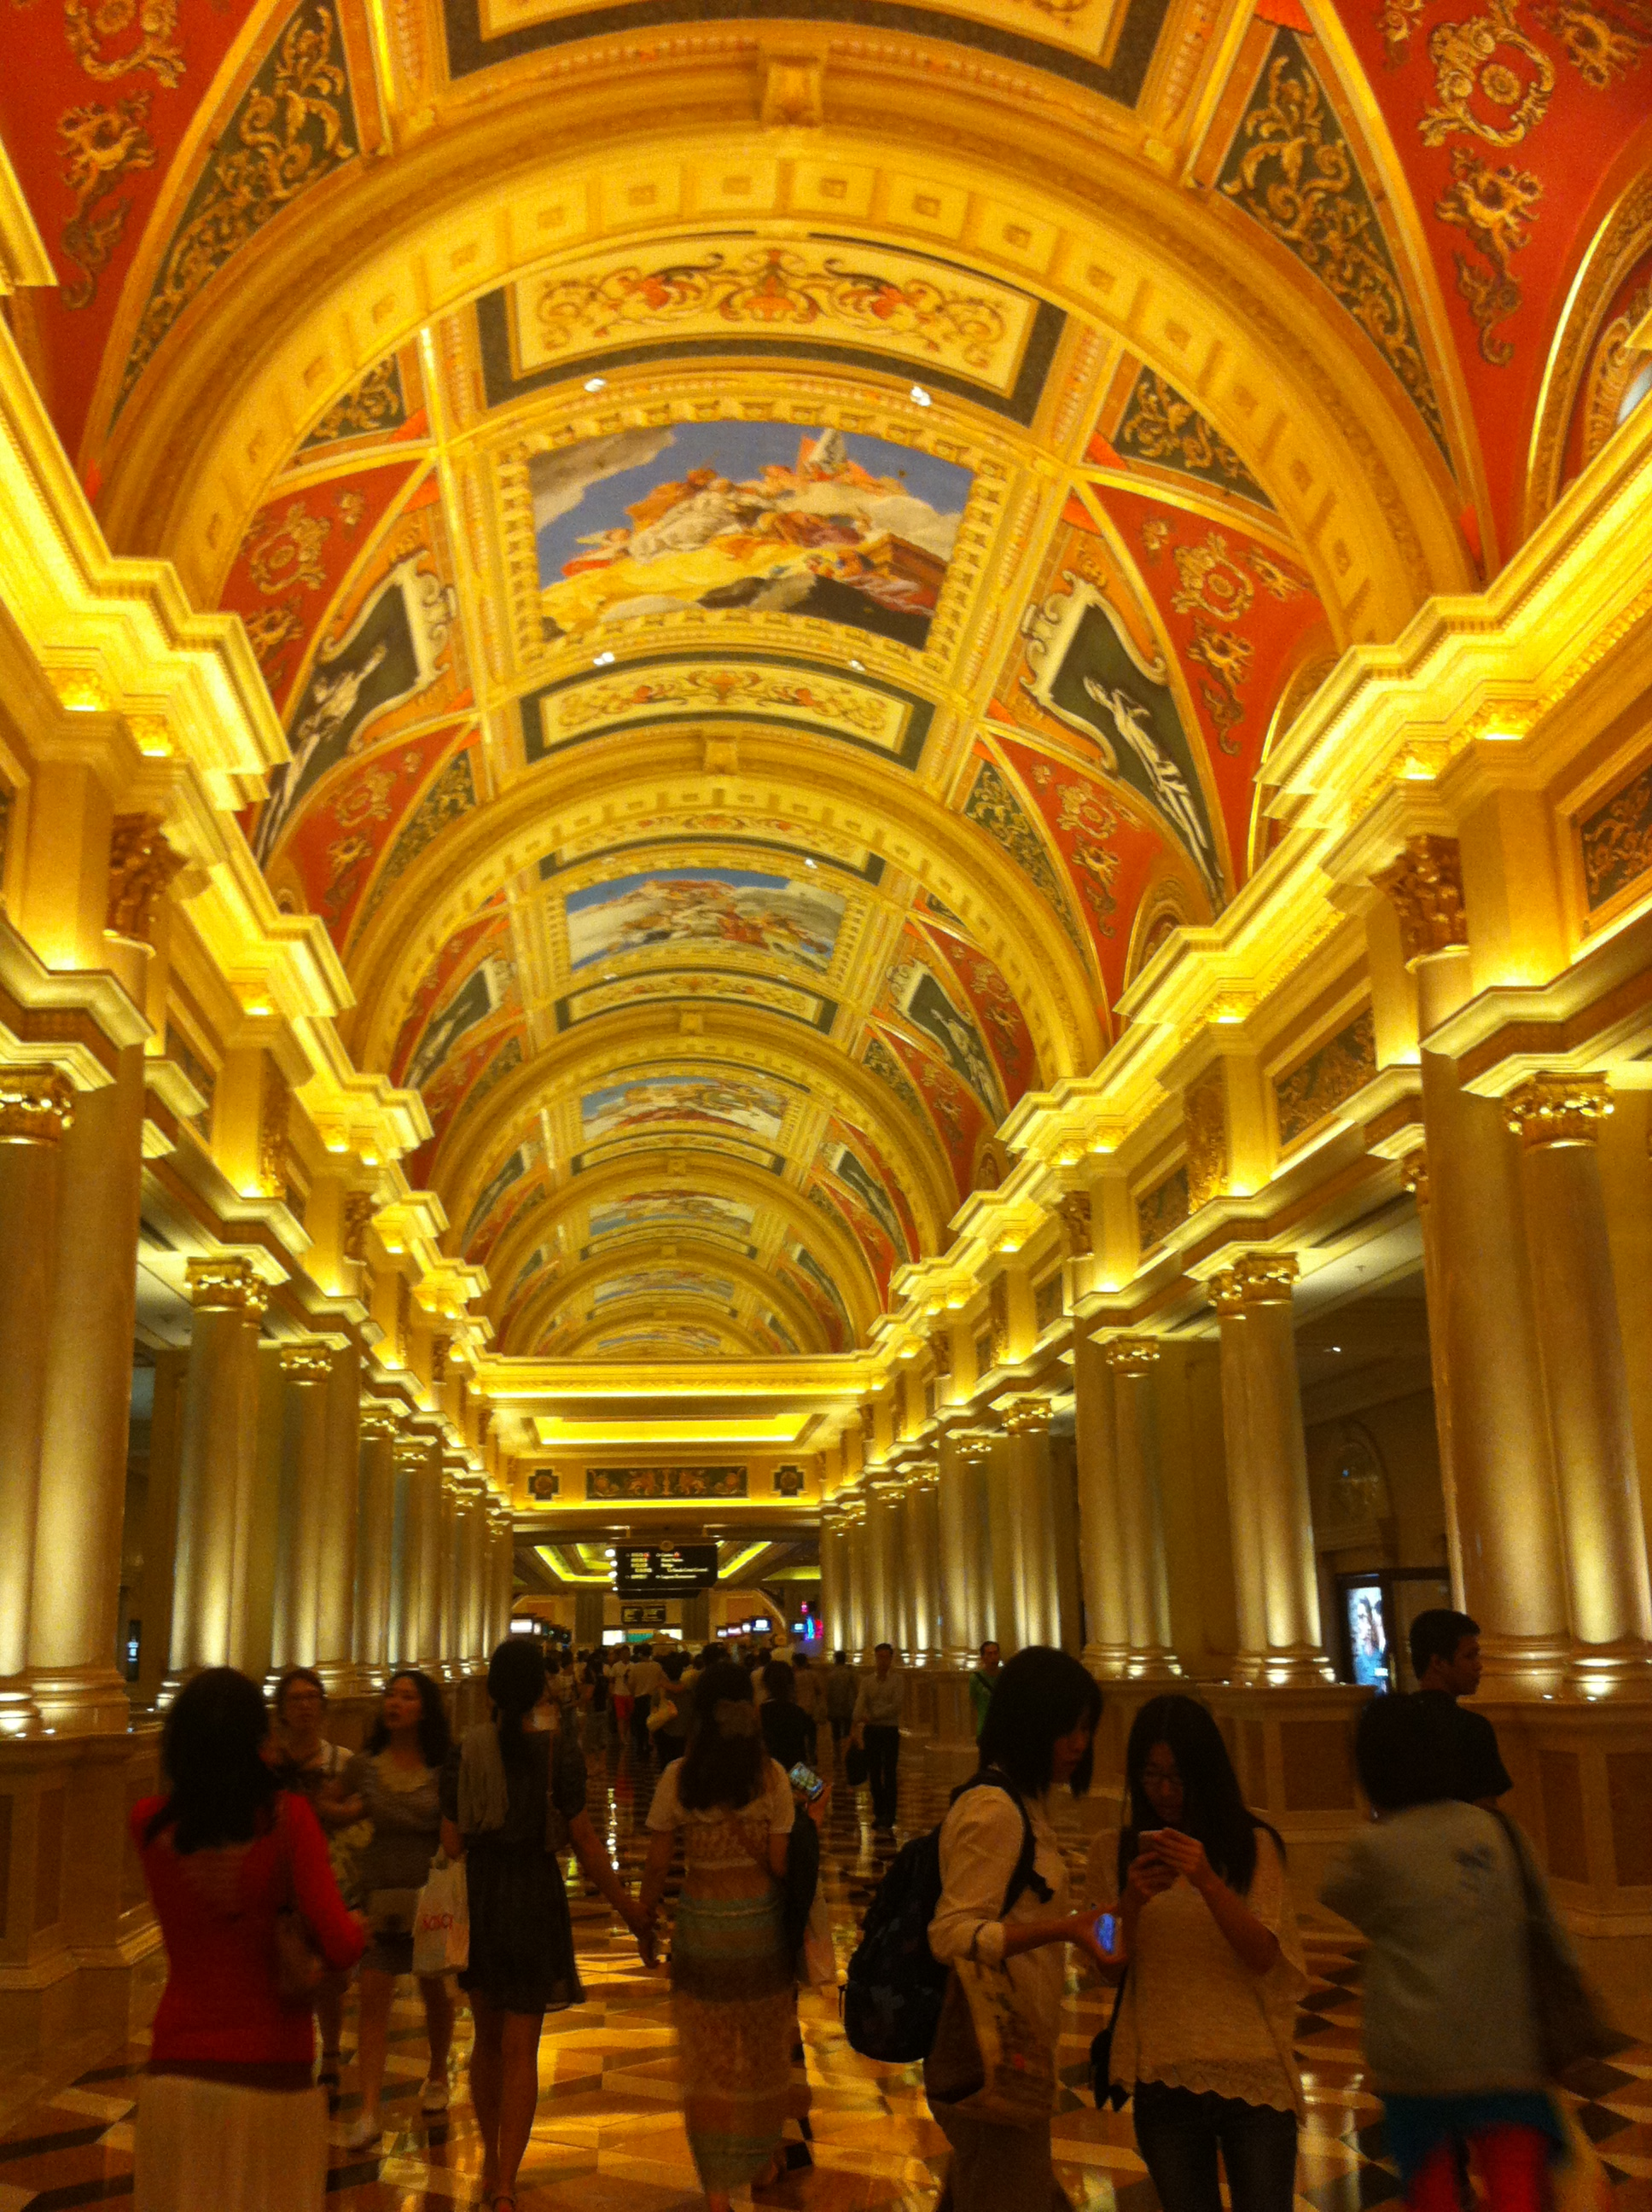 the venetian resort hotel casino las vegas (拉斯维加斯威尼斯人